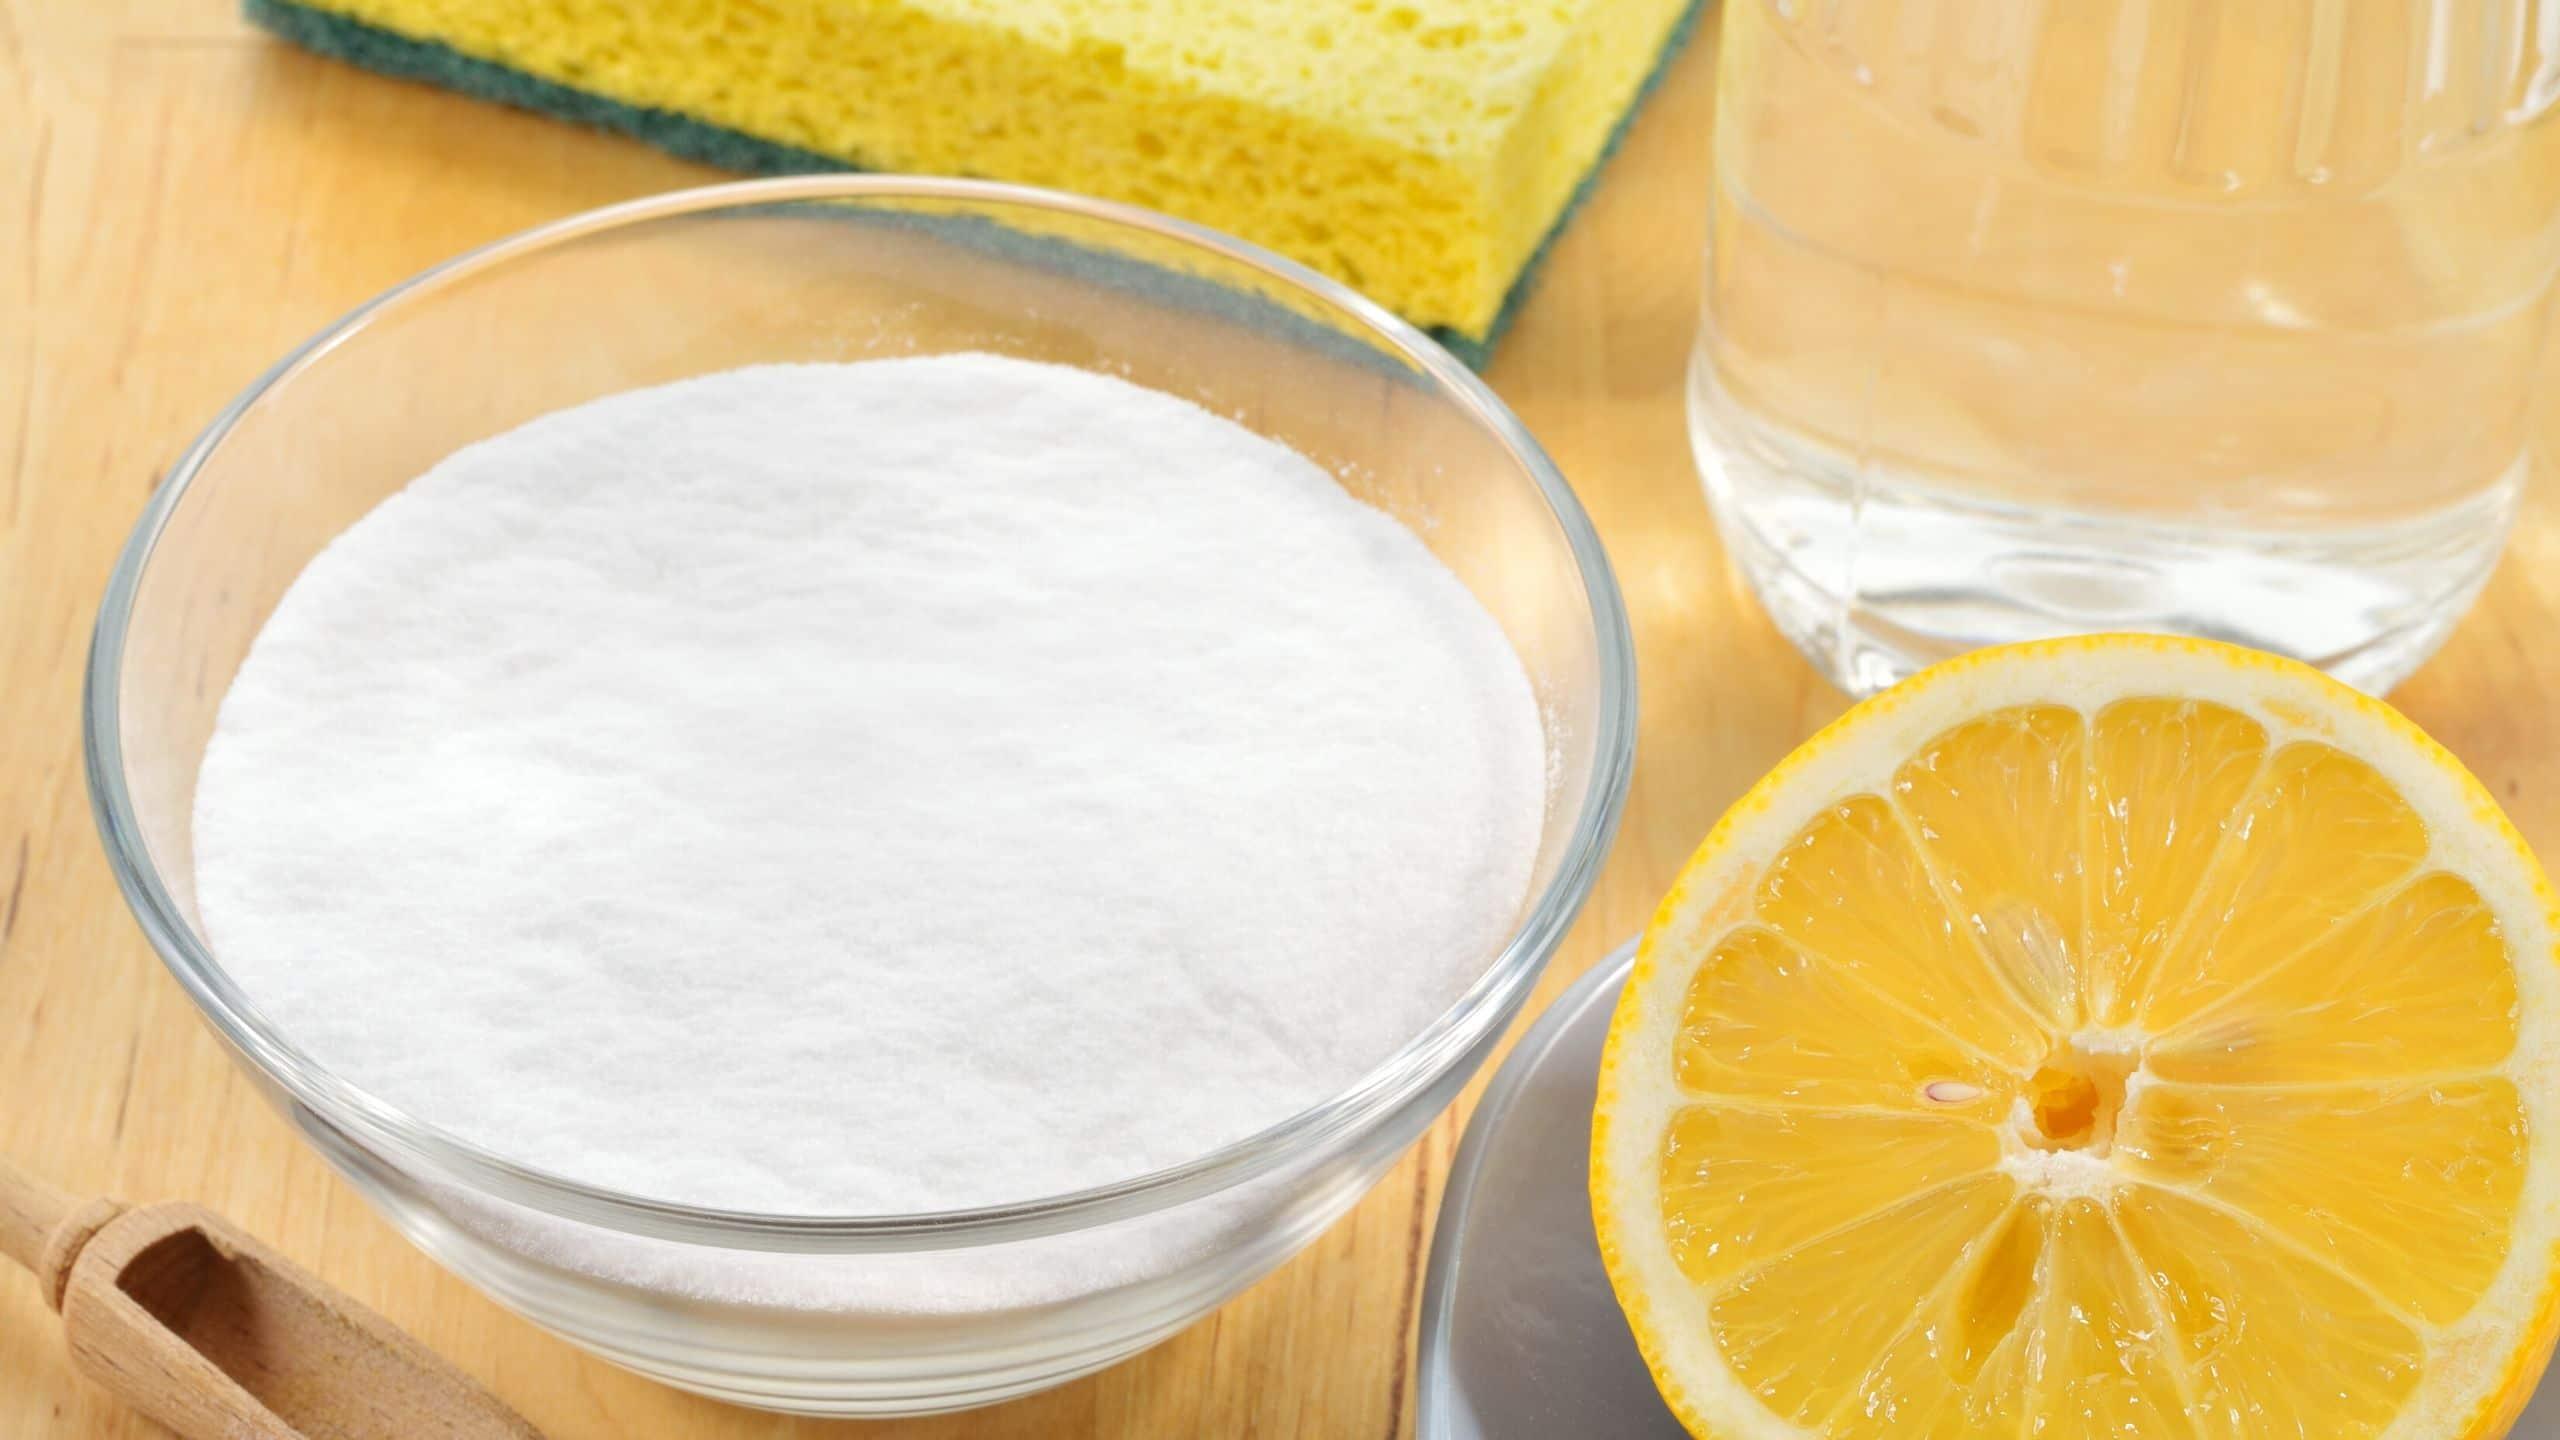 Lemon and Baking Soda For Health, Skin, and Hair